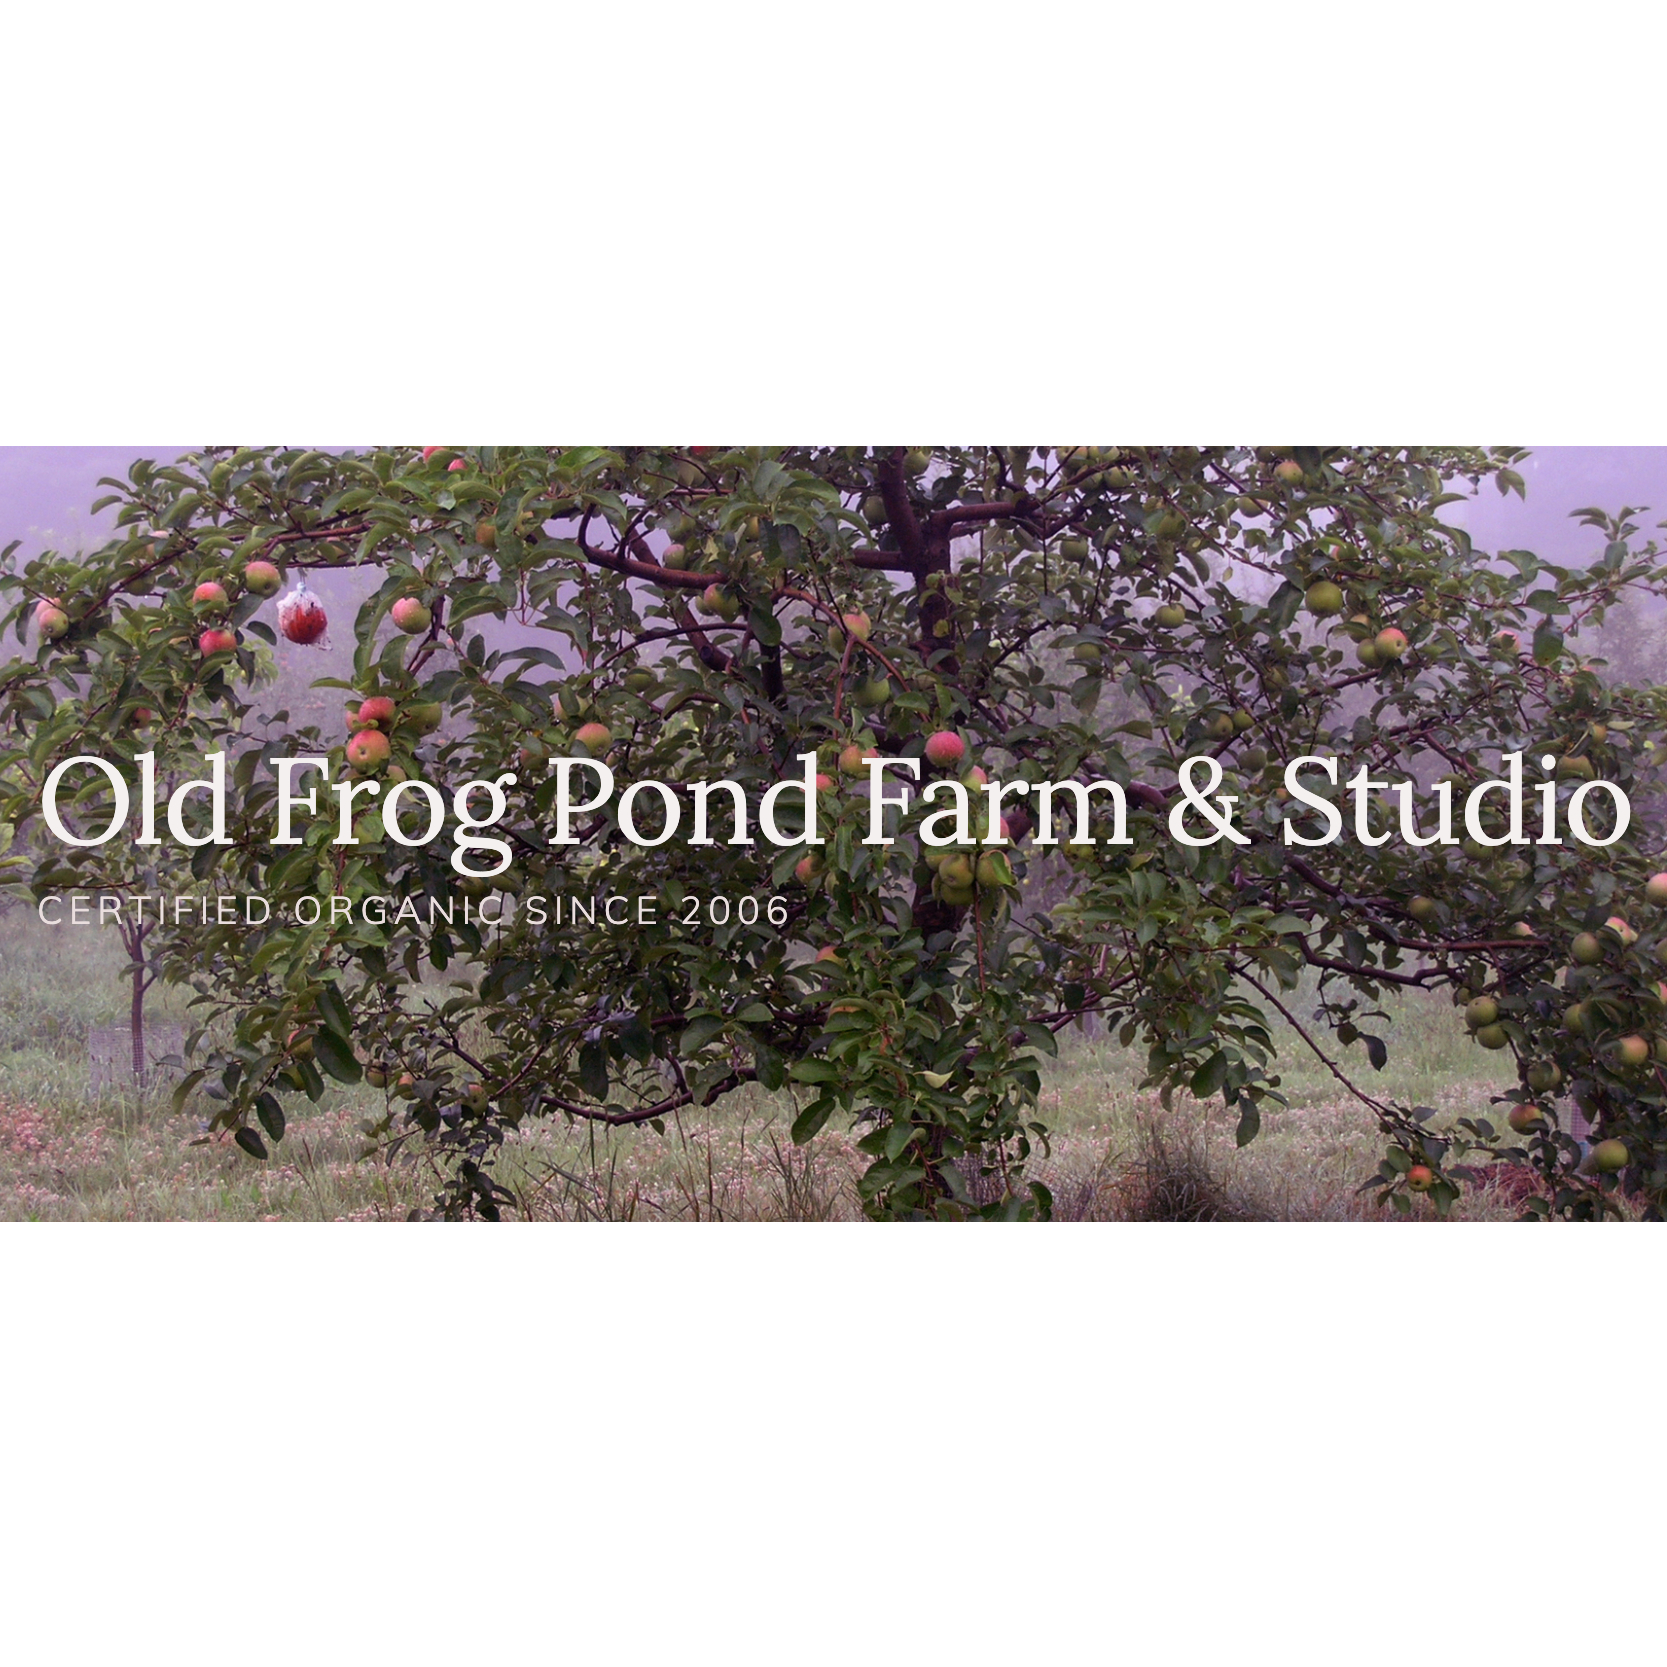 Old Frog Pond Farm & Studio